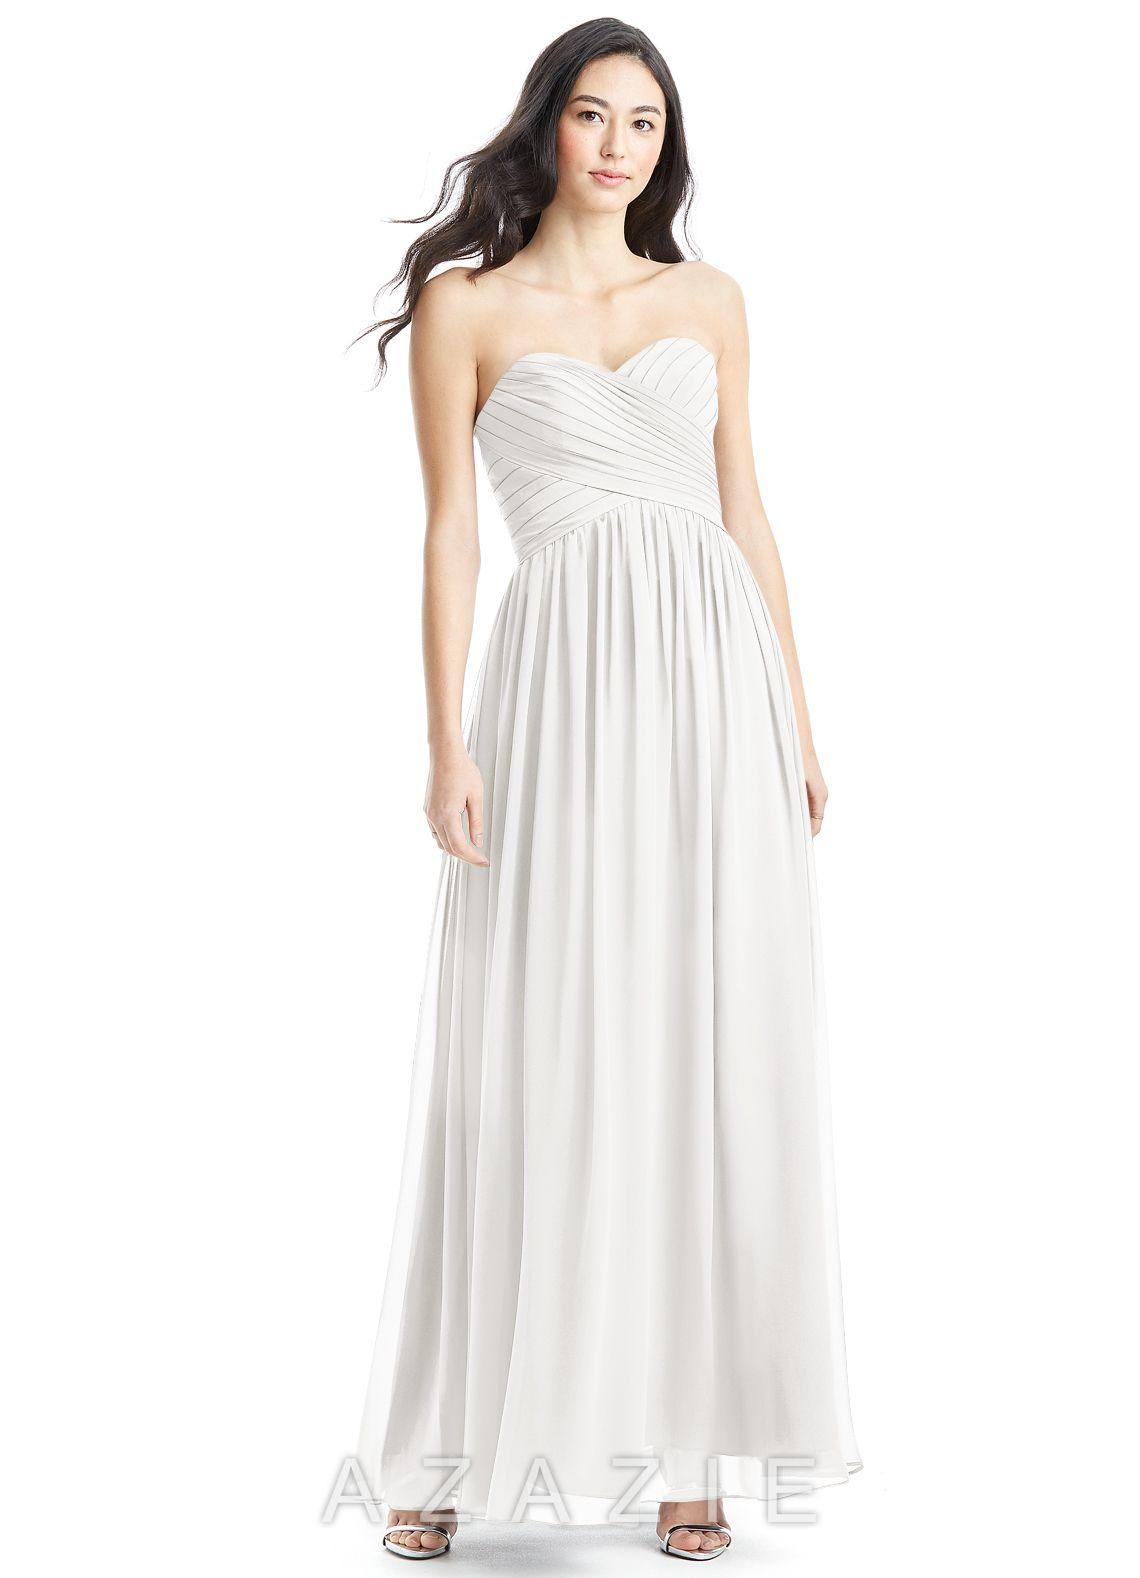 45f0f42a820 Azazie Bridesmaid Dresses For Sale - Gomes Weine AG